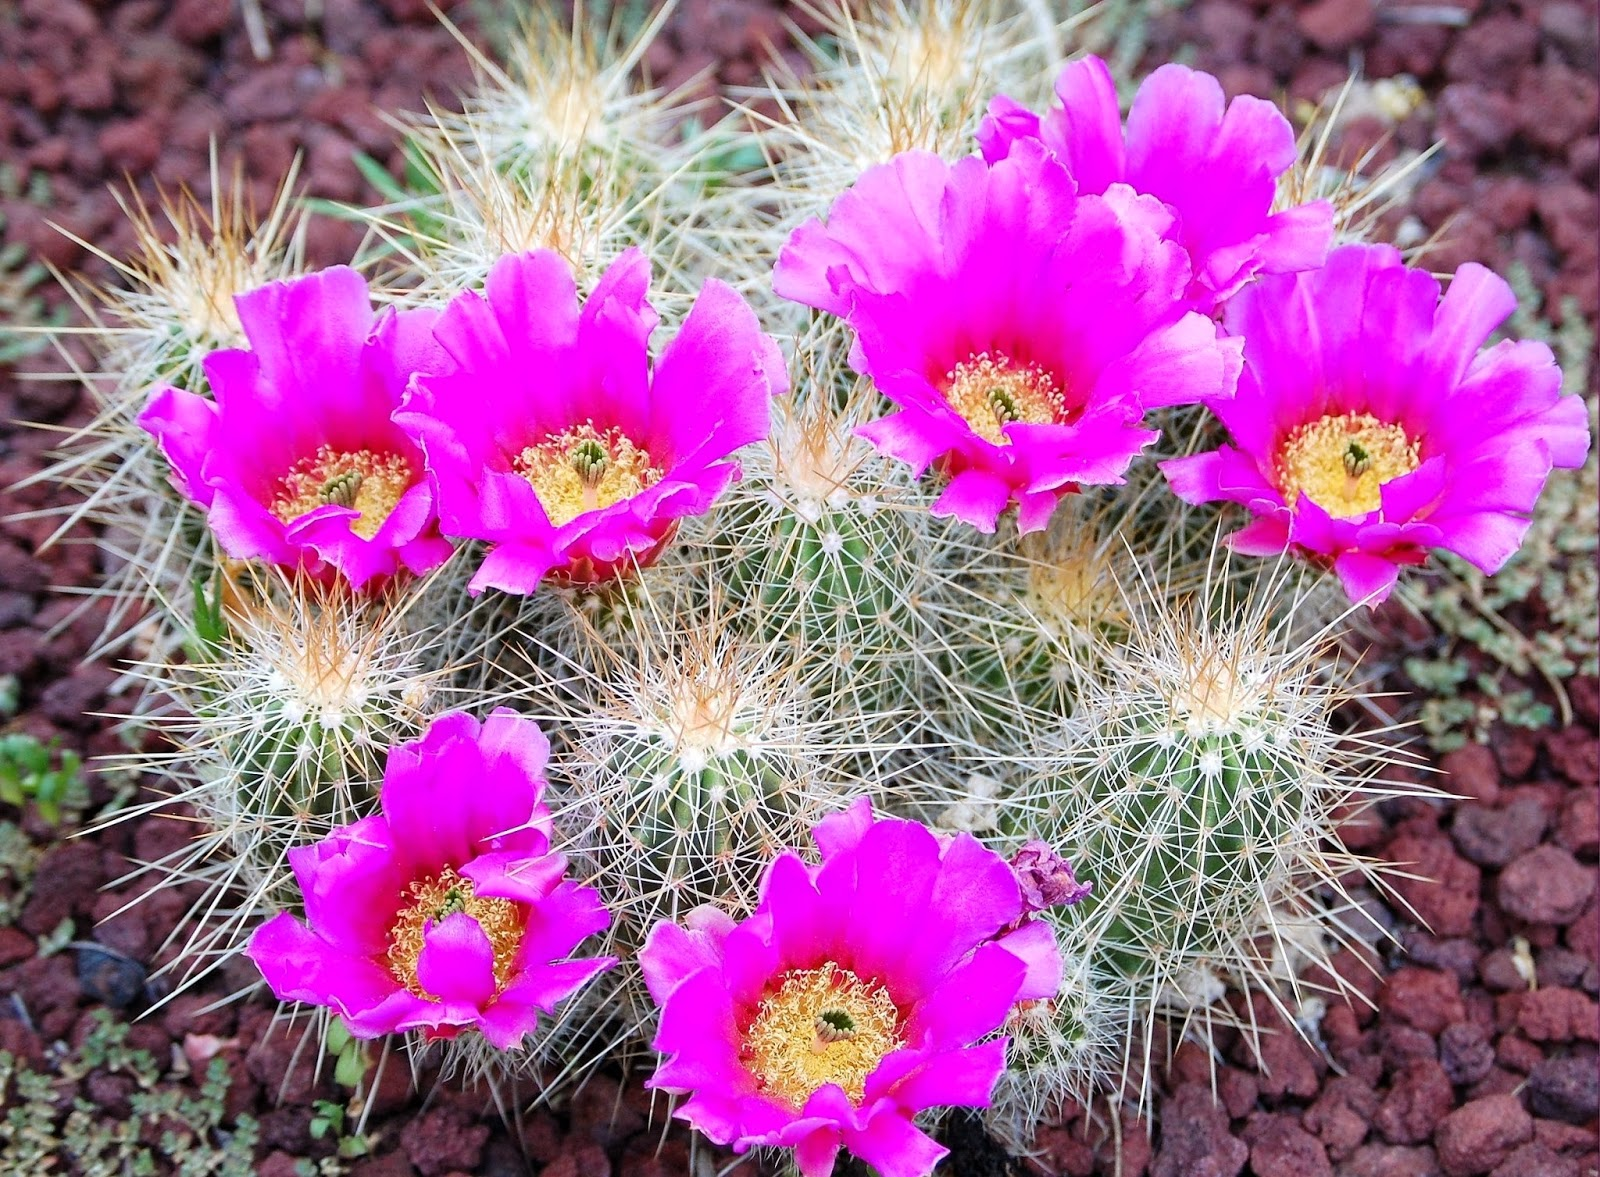 Cactus flower wallpaper puter free beautiful desktop wallpapers 2014